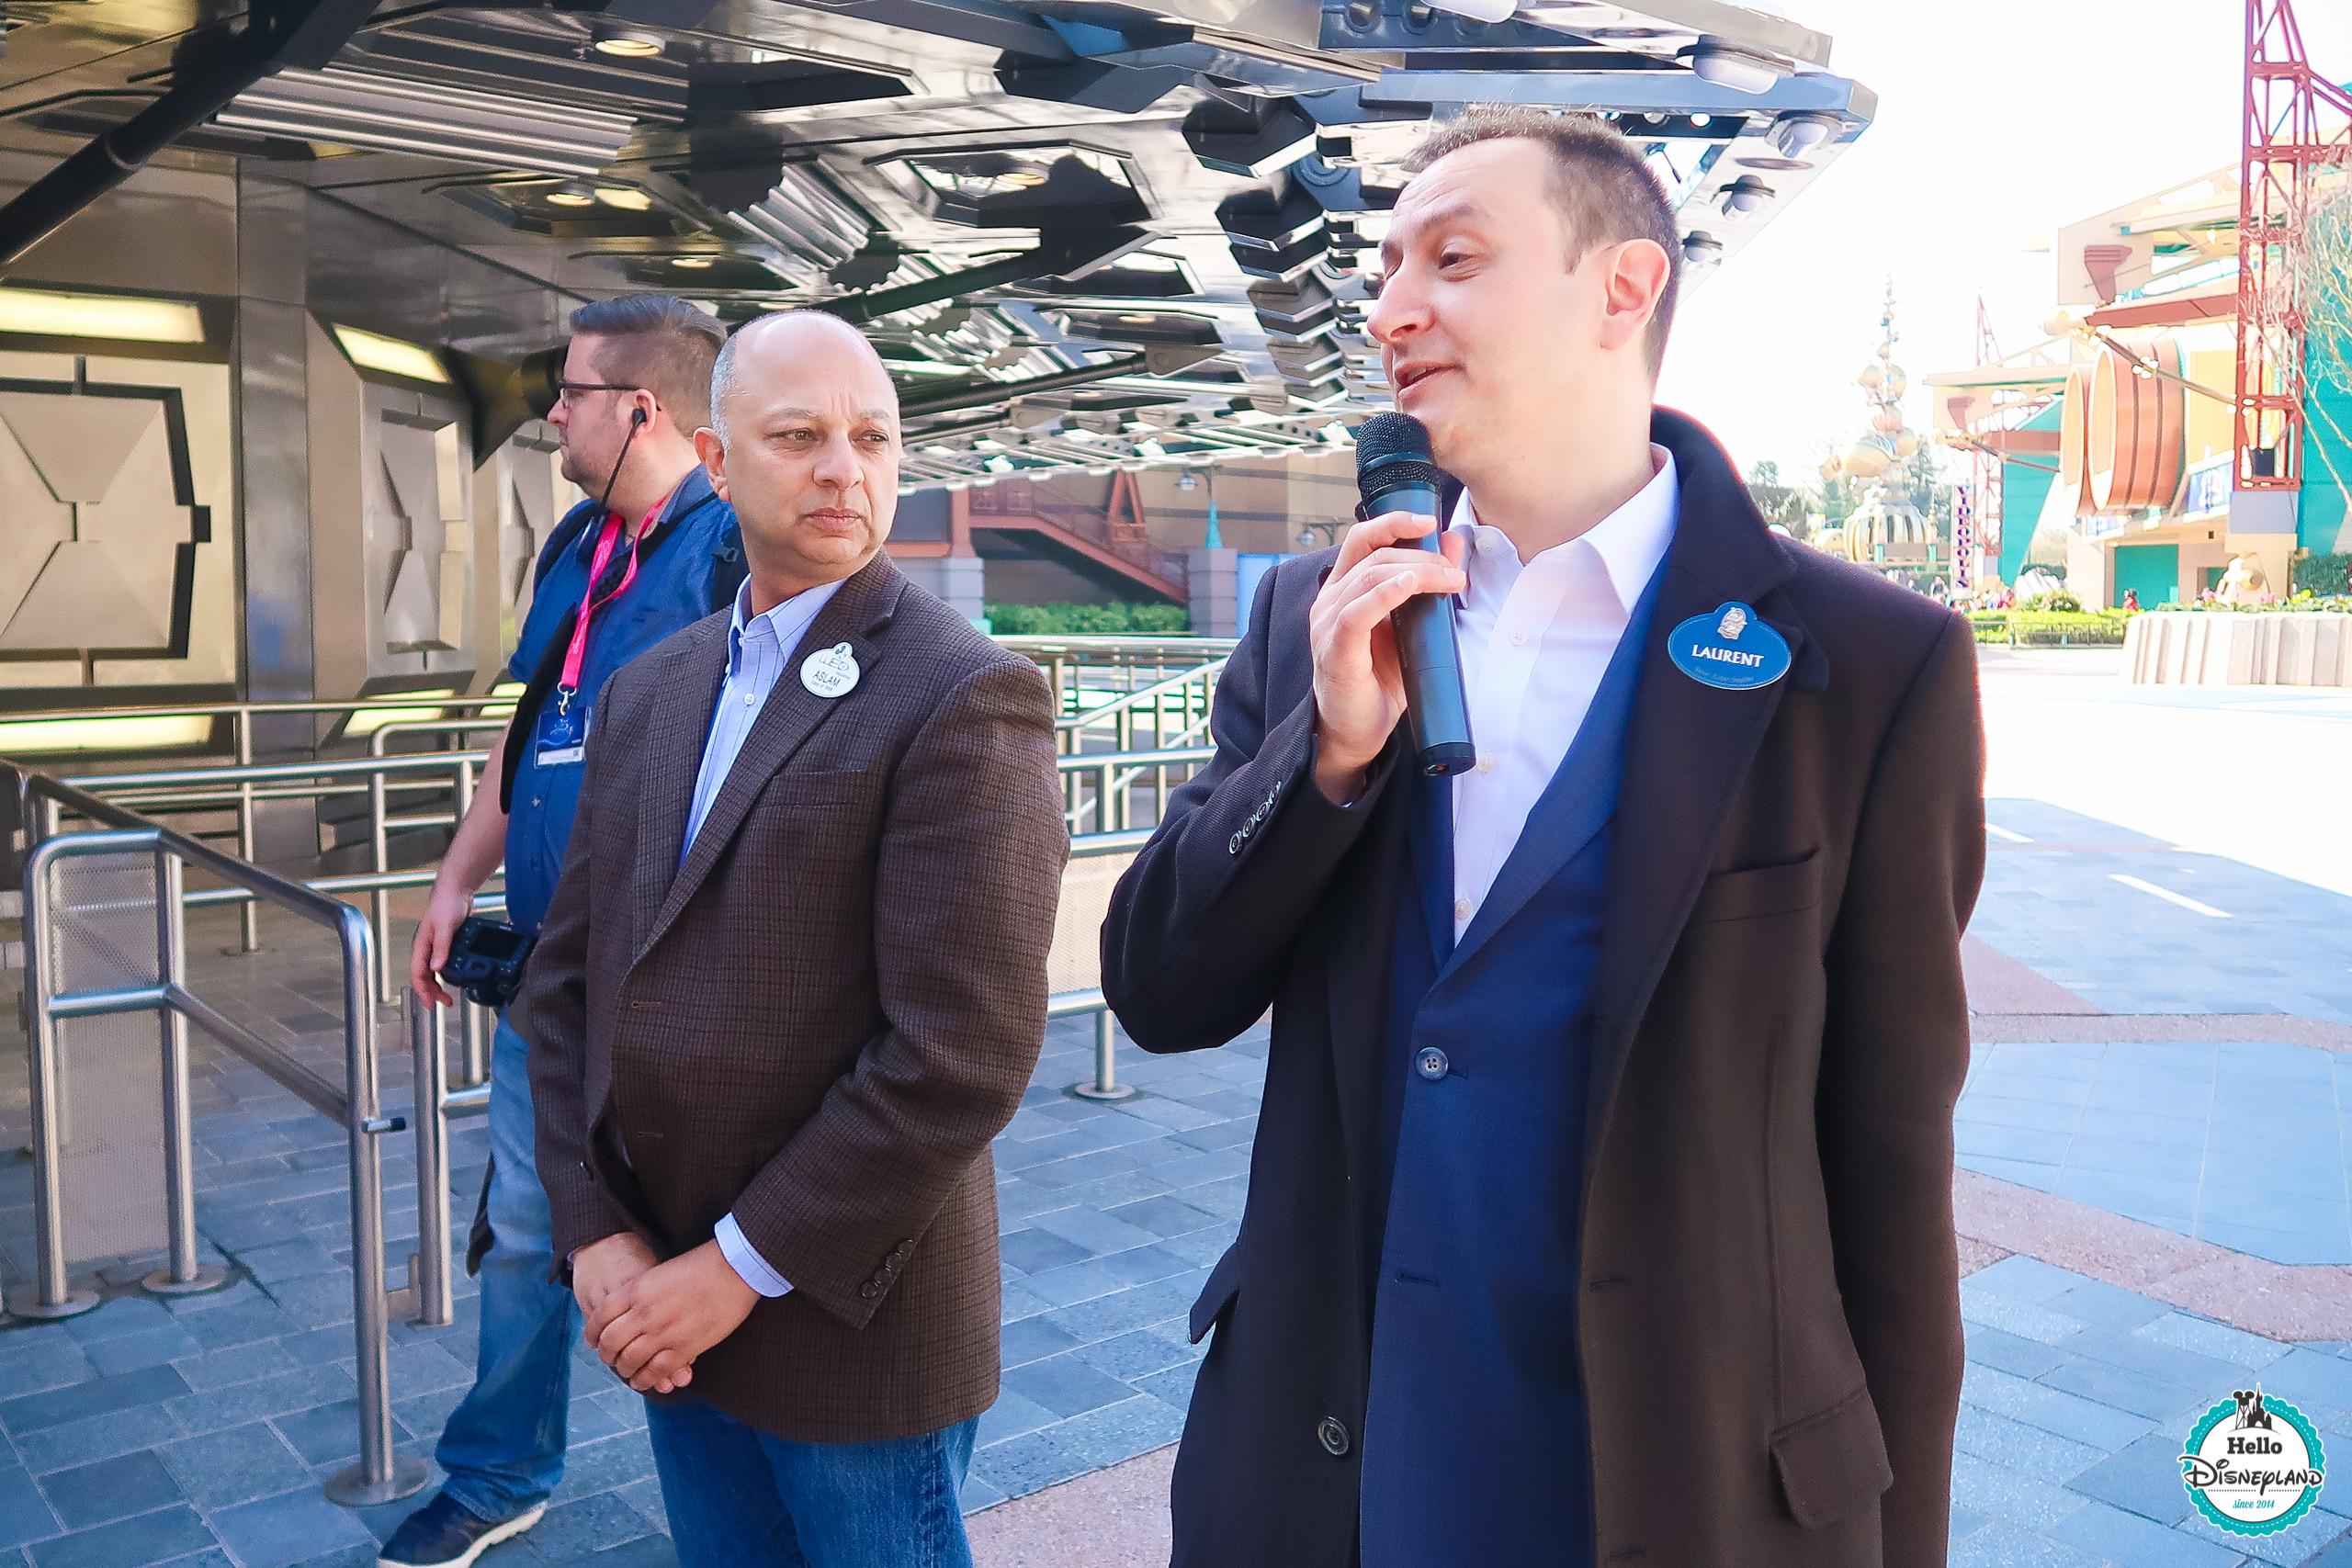 Hello Disneyland Press Event 25 ans - Disneyland Paris